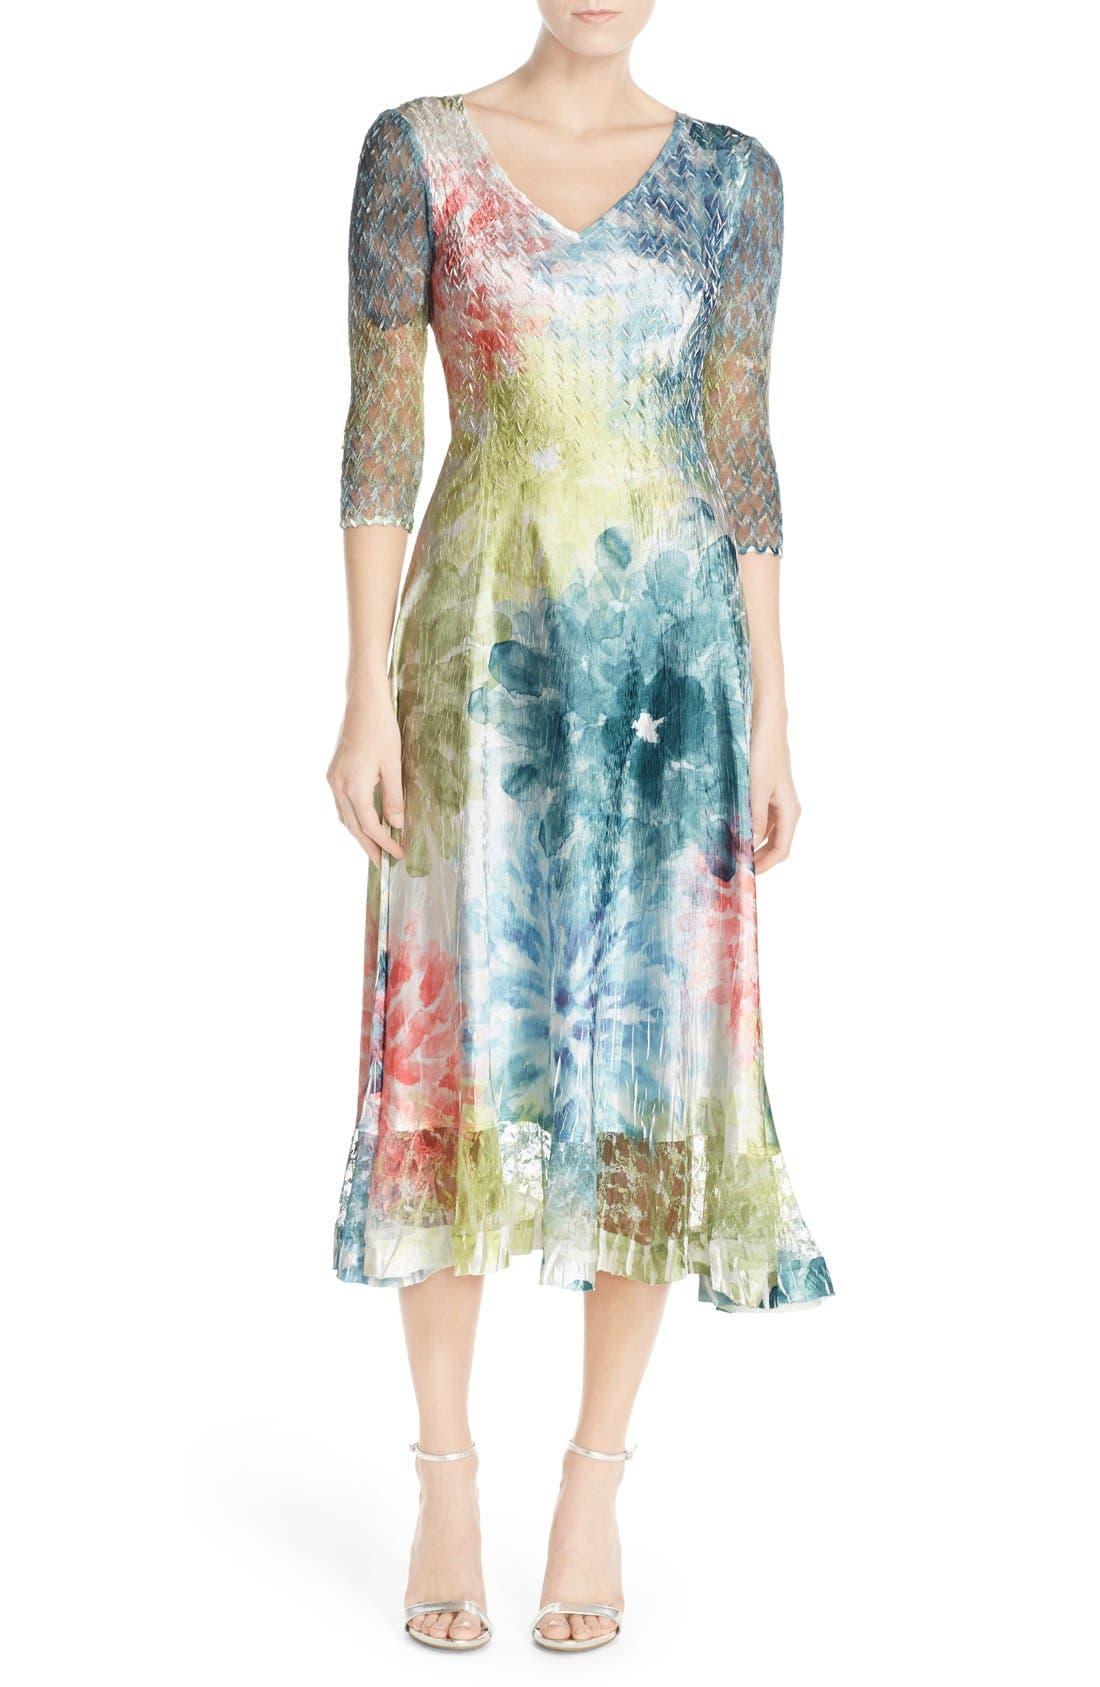 Alternate Image 1 Selected - Komarov Mixed Media A-Line Dress (Regular & Petite)